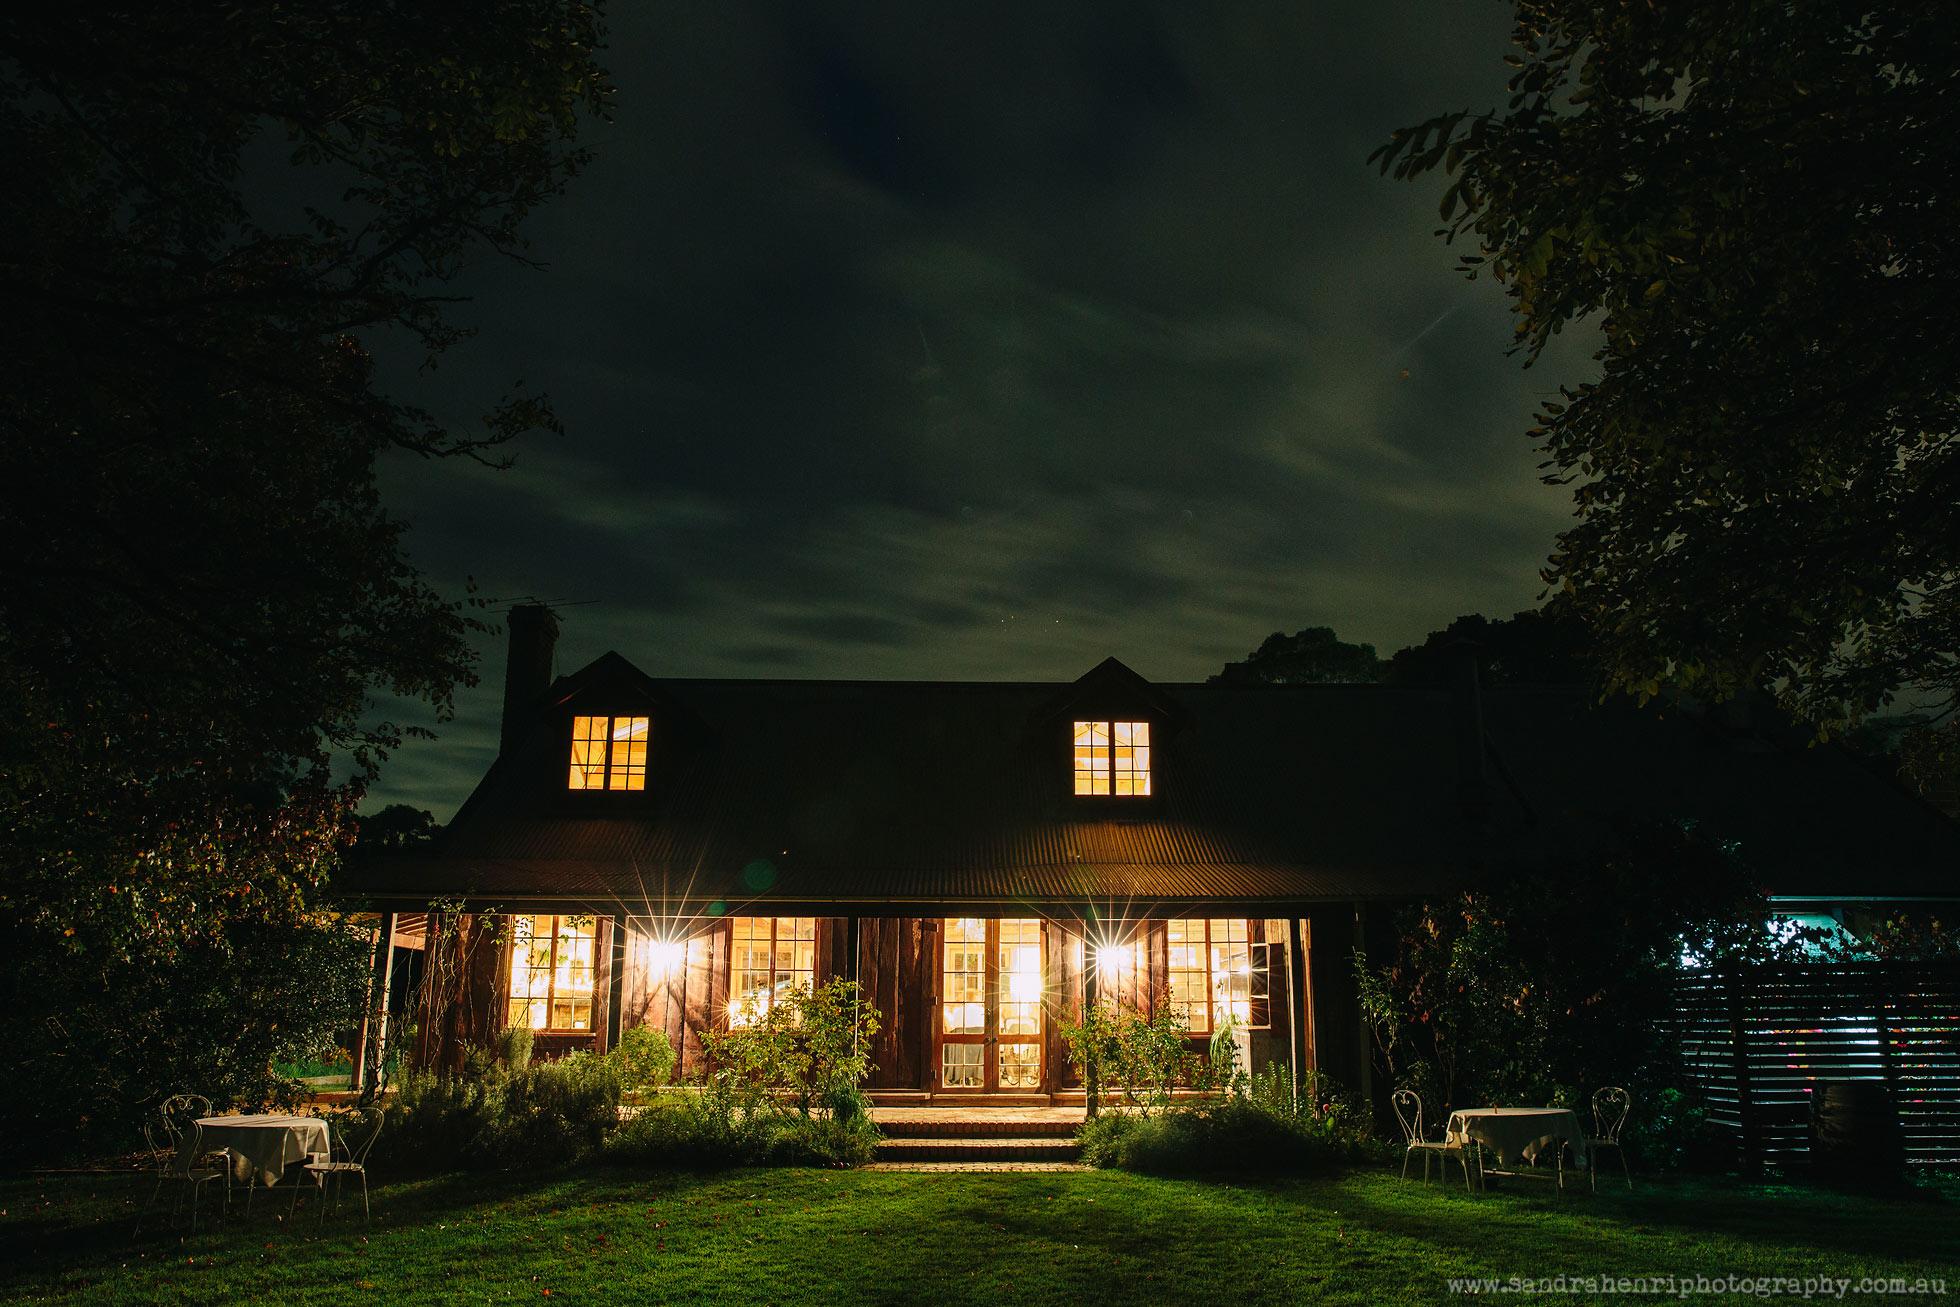 Roberts-Restaurant-garden-wedding-images-34.jpg